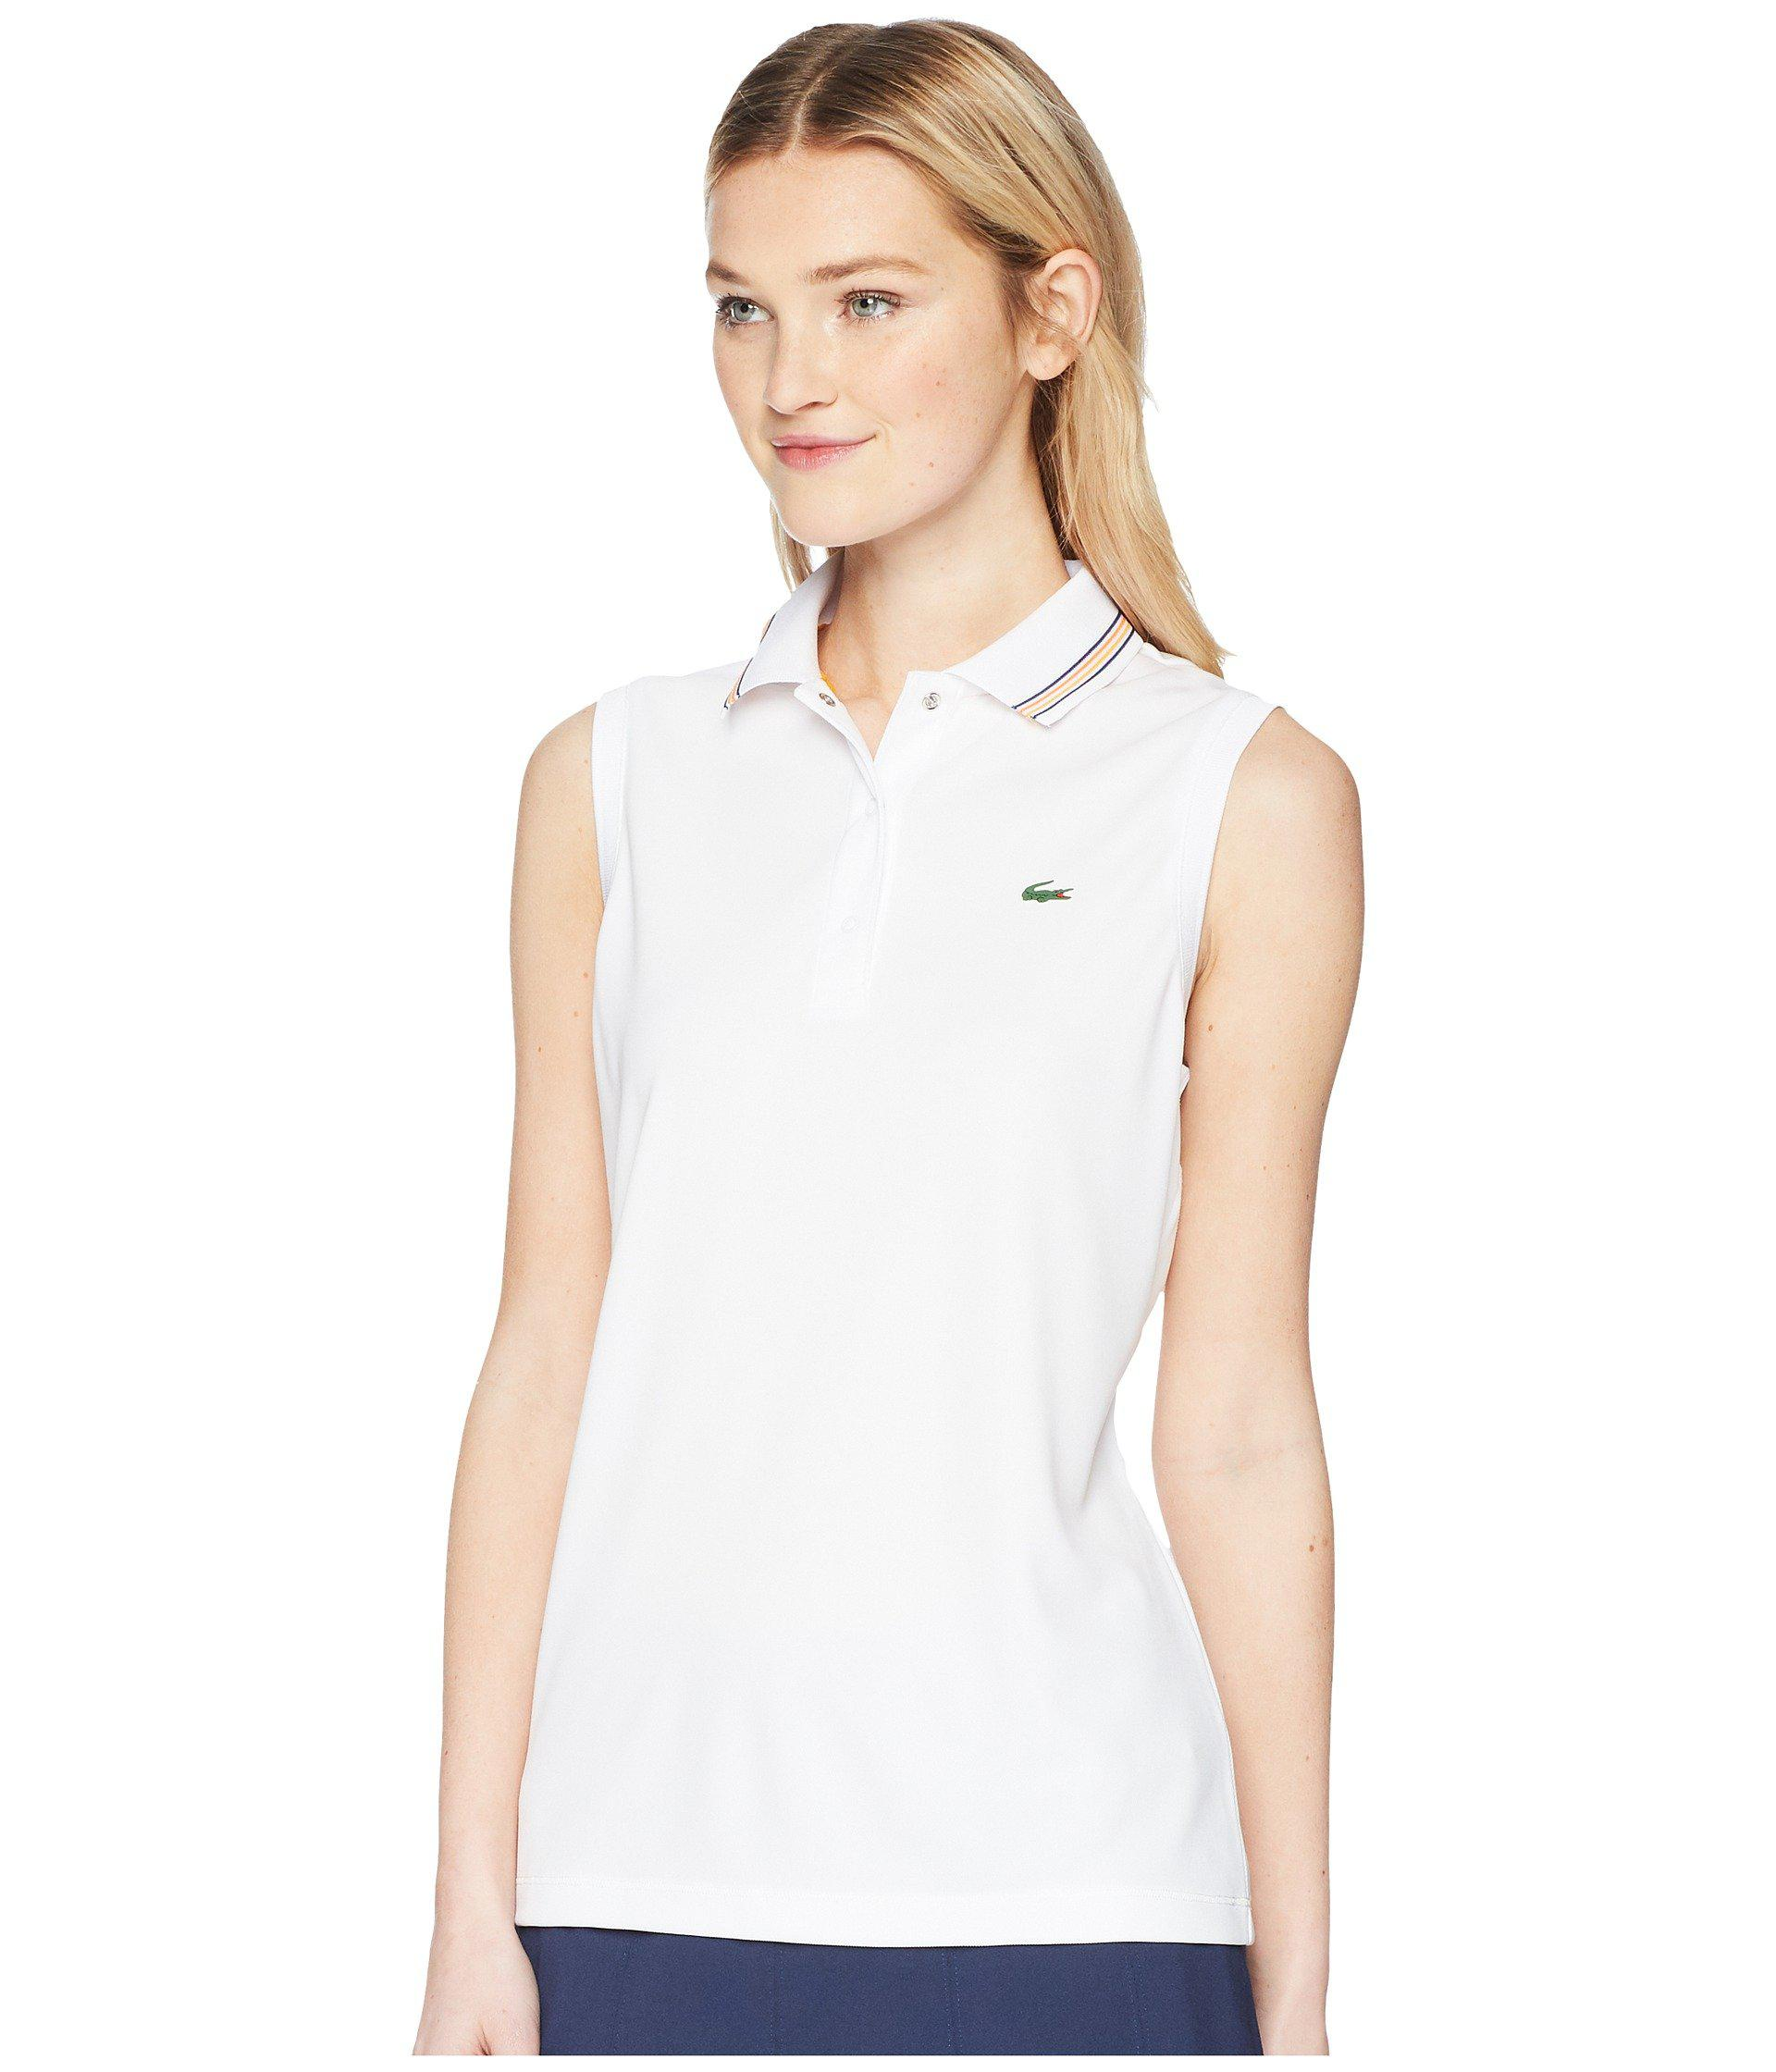 Lacoste Womens Sleeveless Polo Shirts Rockwall Auction